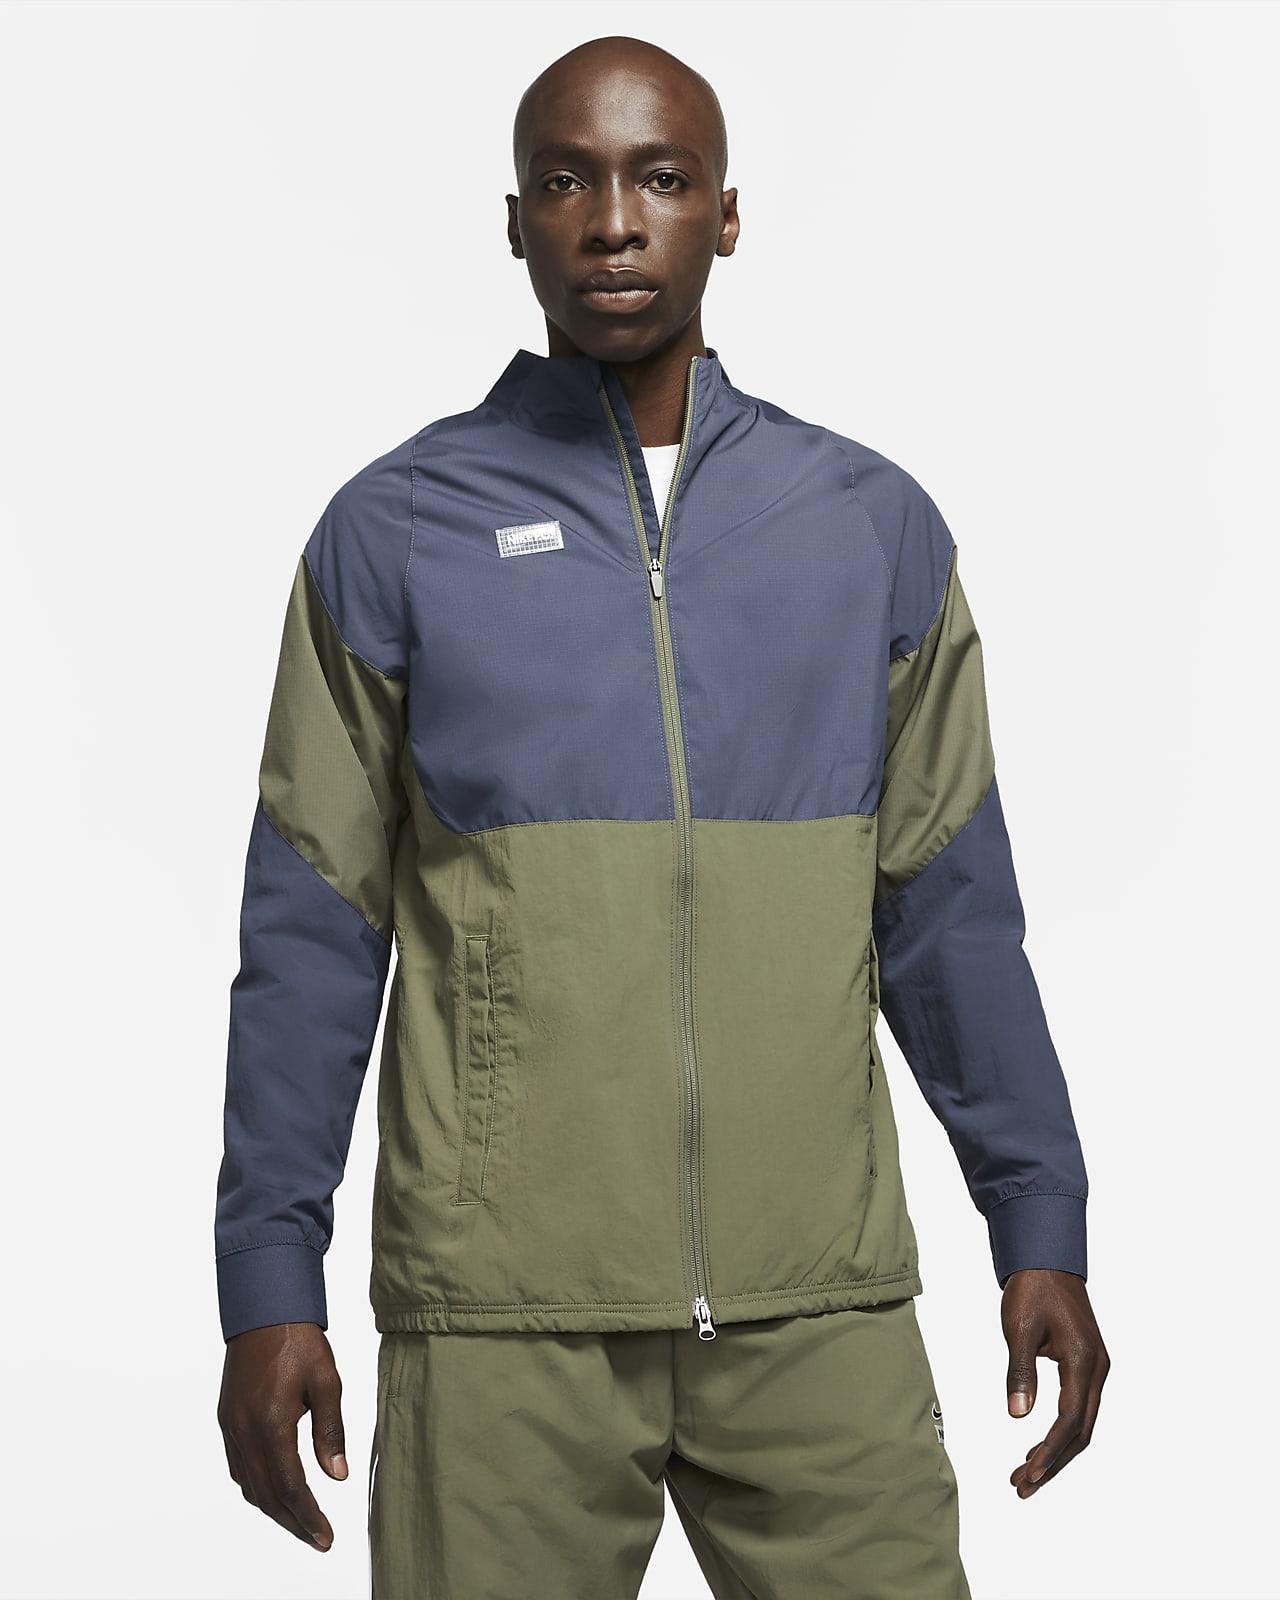 Nike F.C. AWF Men's Woven Football Tracksuit Jacket